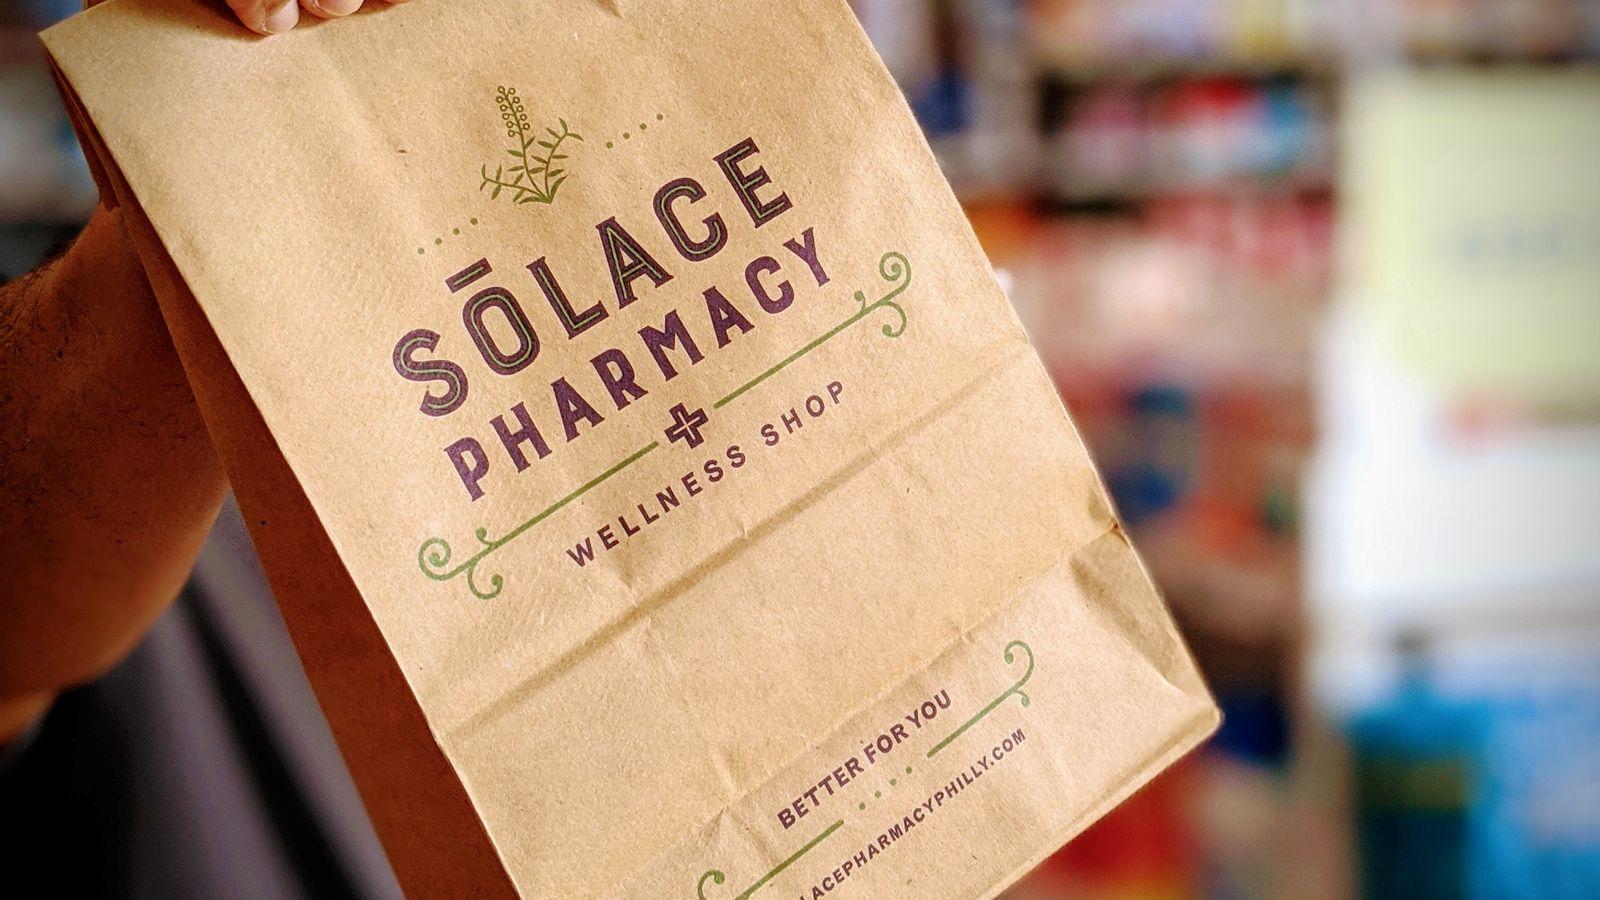 SOLACE_PHARMACY_BAG_IMAGE_16X9.jpg